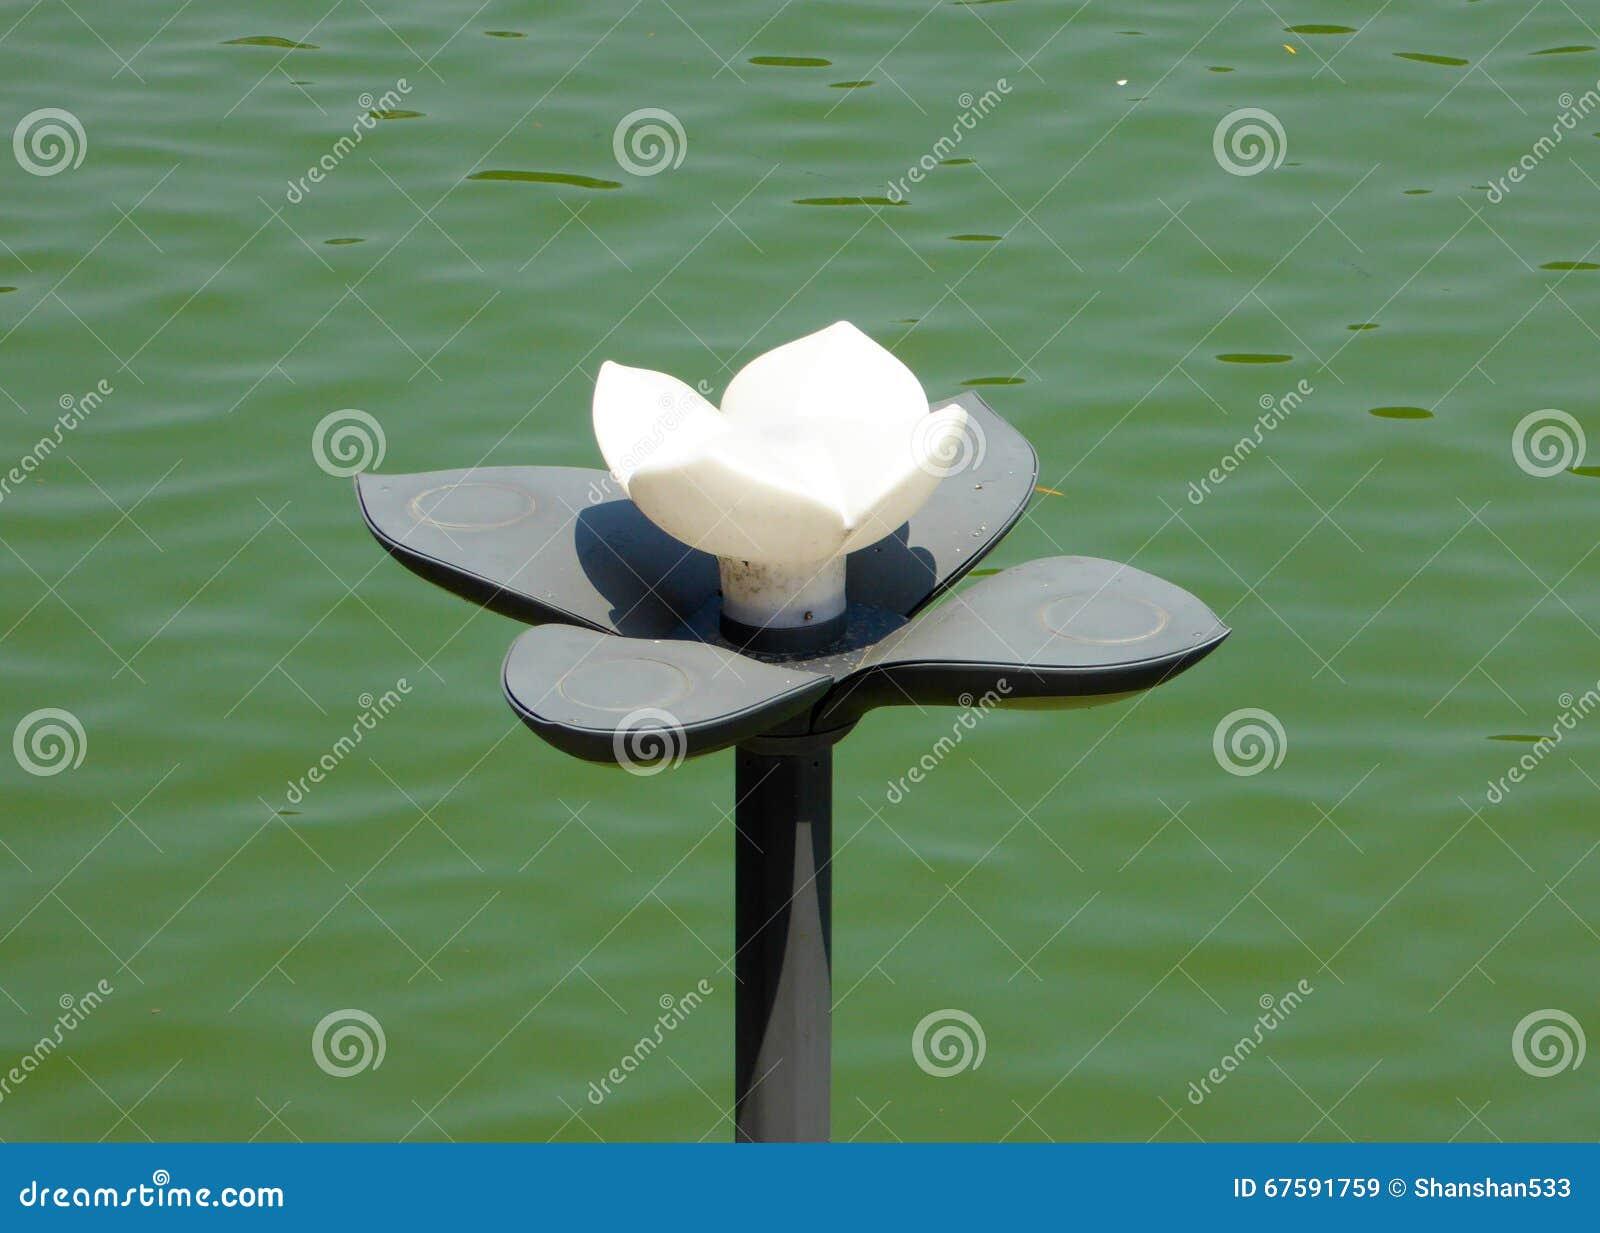 Lamp shaped like a lotus flower stock image image of archaic download lamp shaped like a lotus flower stock image image of archaic column izmirmasajfo